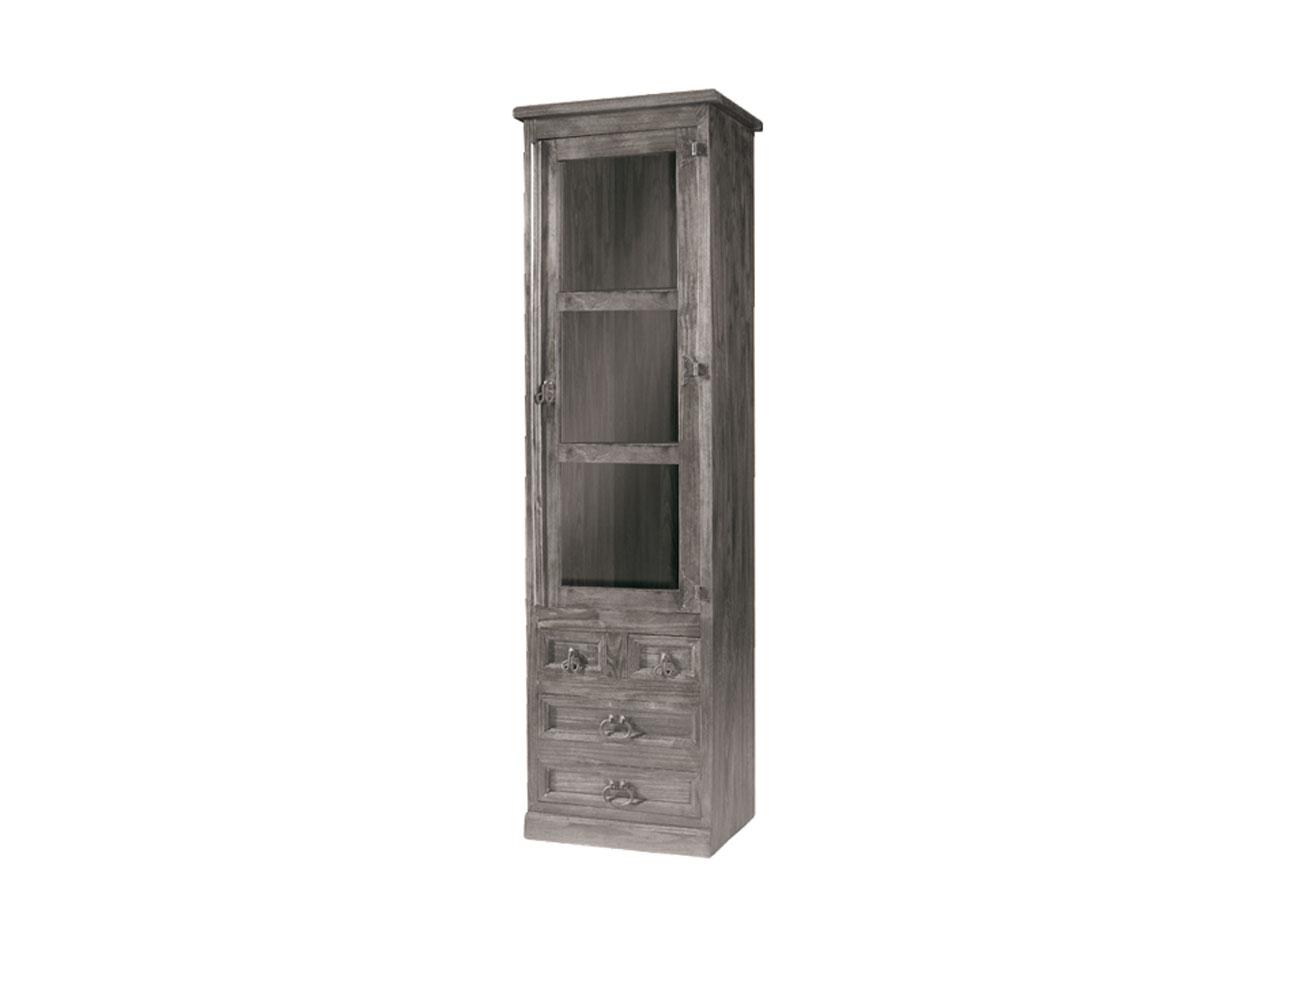 3010851 bodeguero alto jalisco 2p izda madera 58 200 44